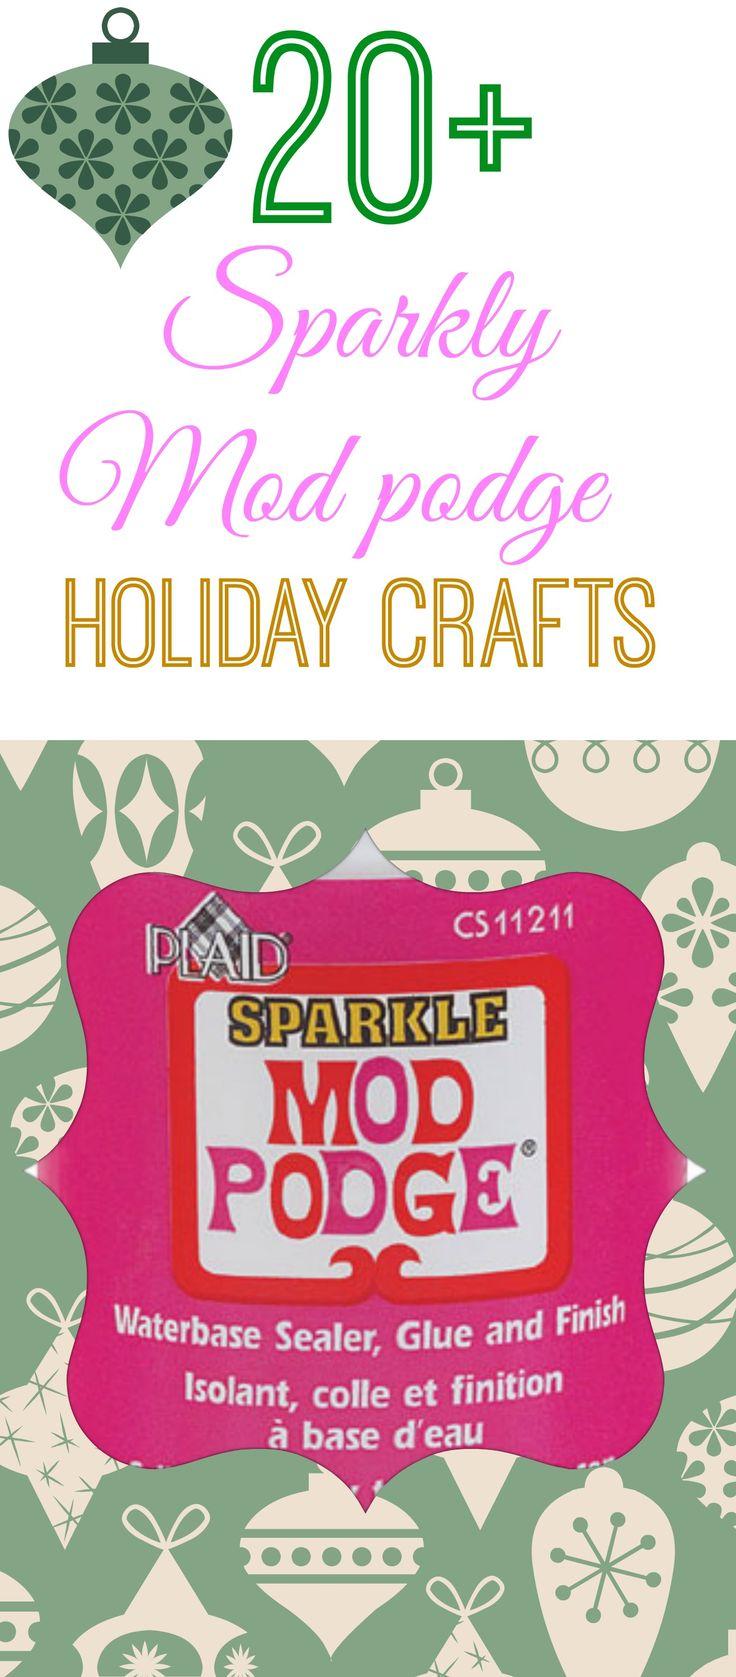 20+ #ModPodgeHoliday crafts with Sparkle #modpodge